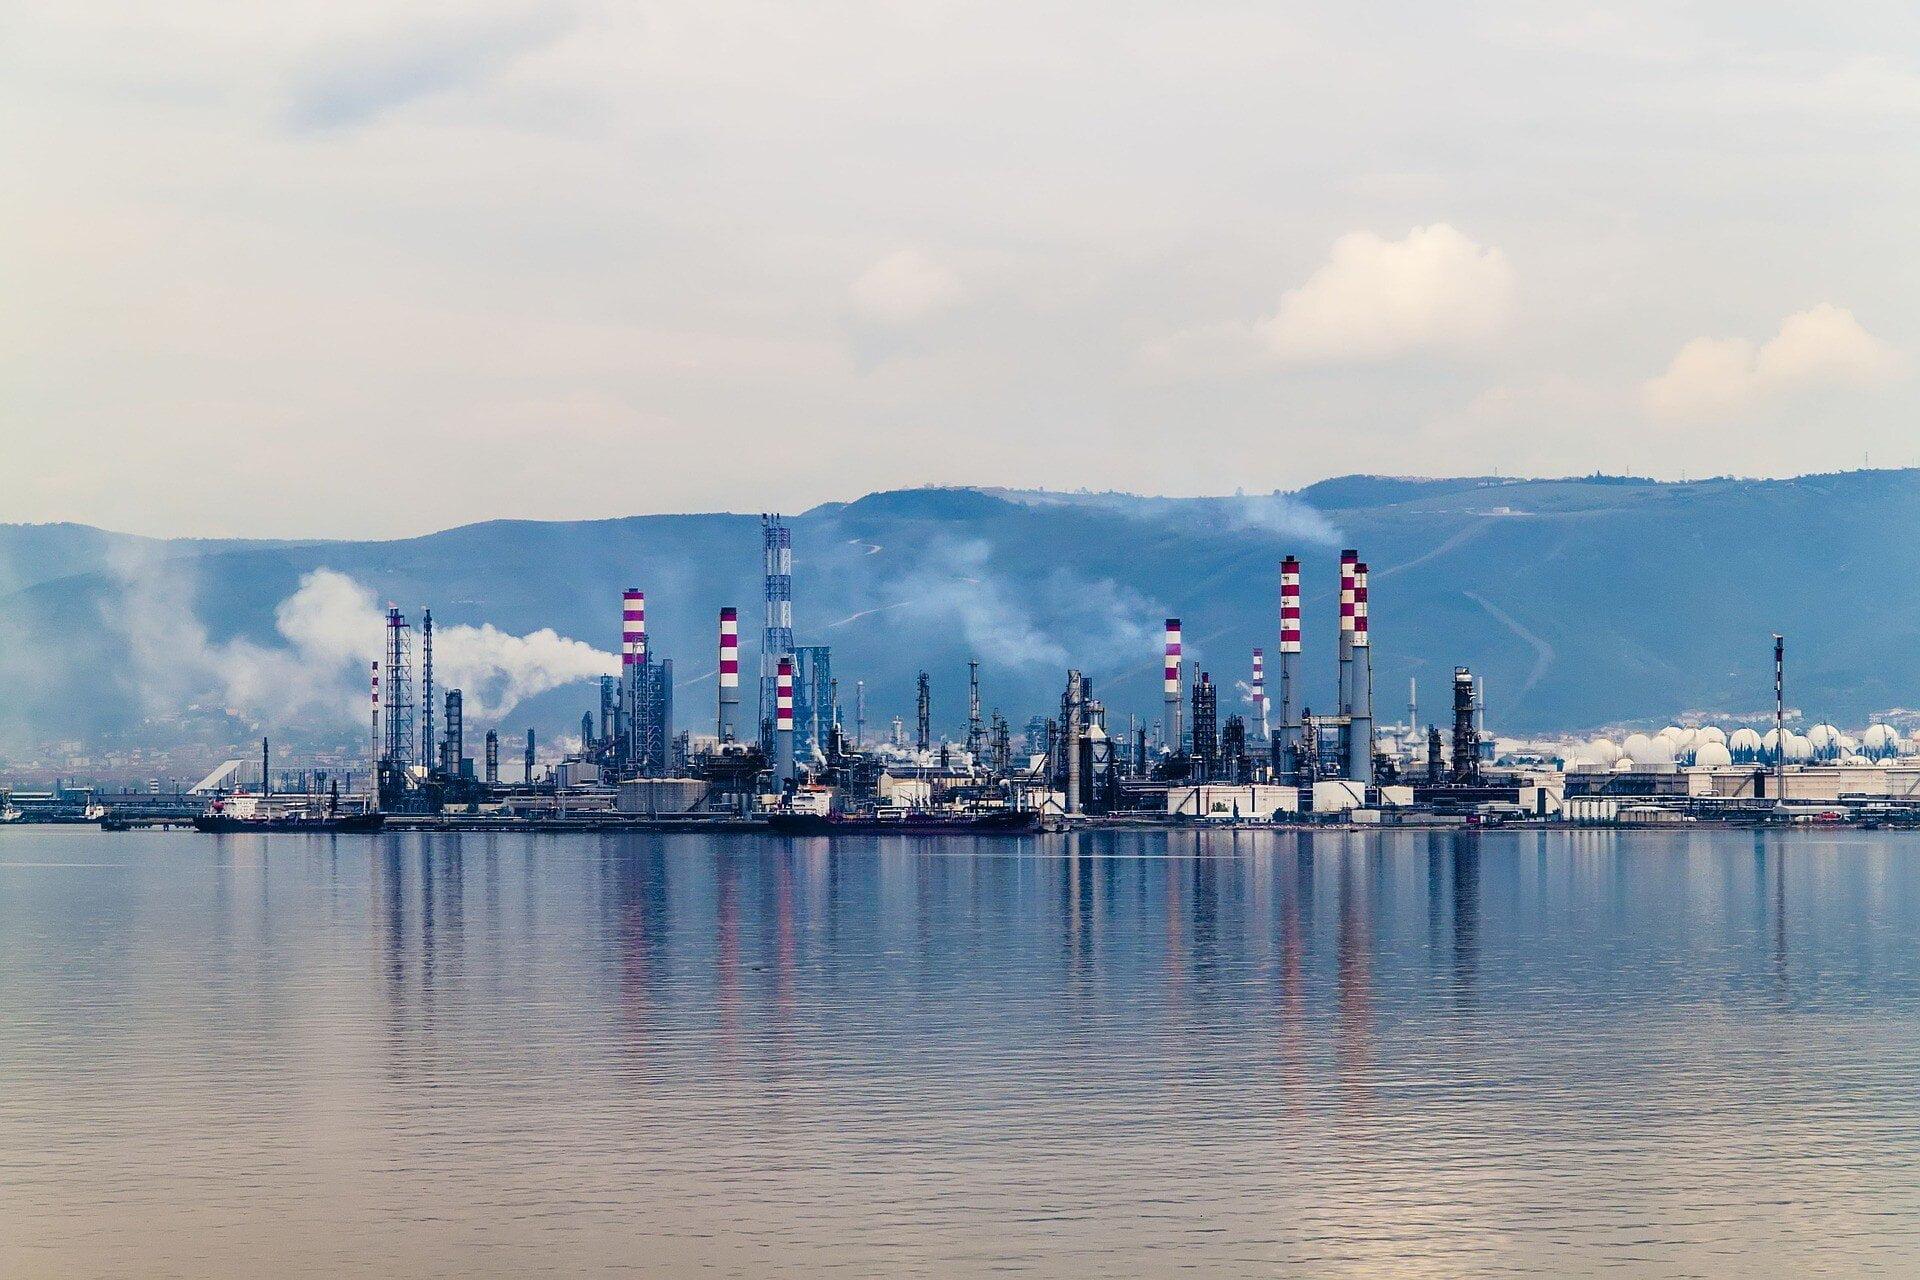 Digital Transformation in Oil & Gas